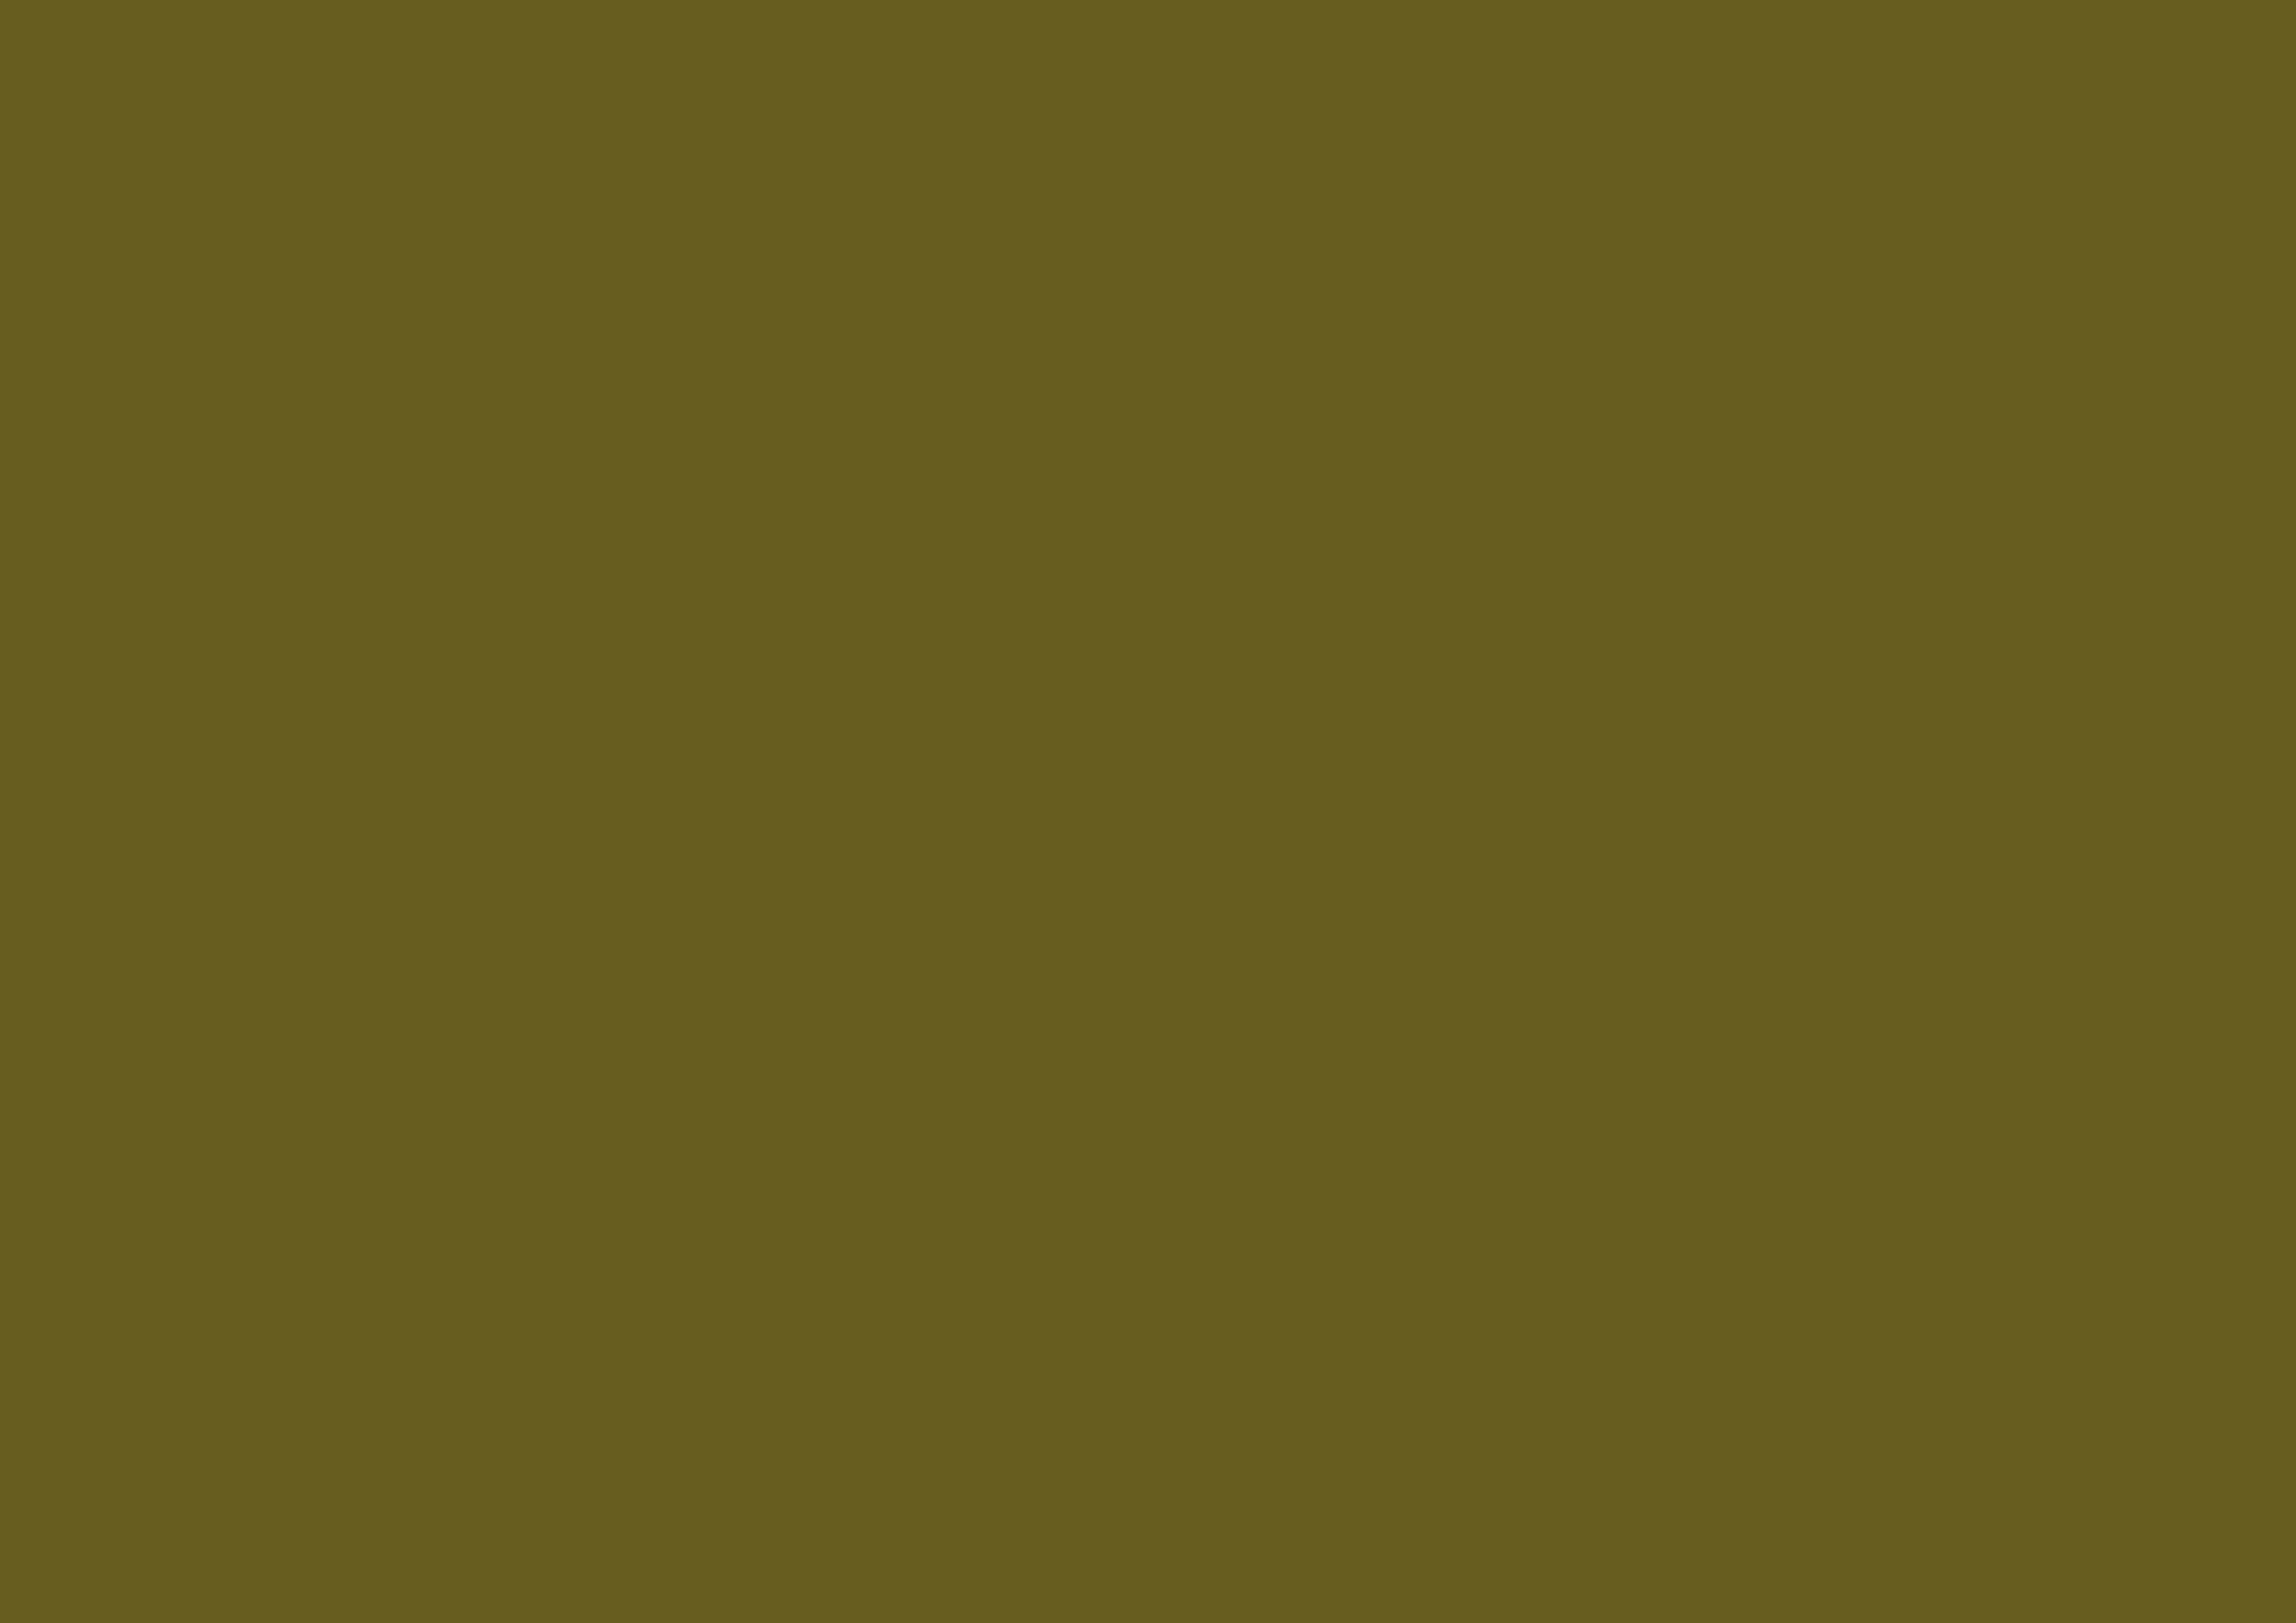 3508x2480 Antique Bronze Solid Color Background